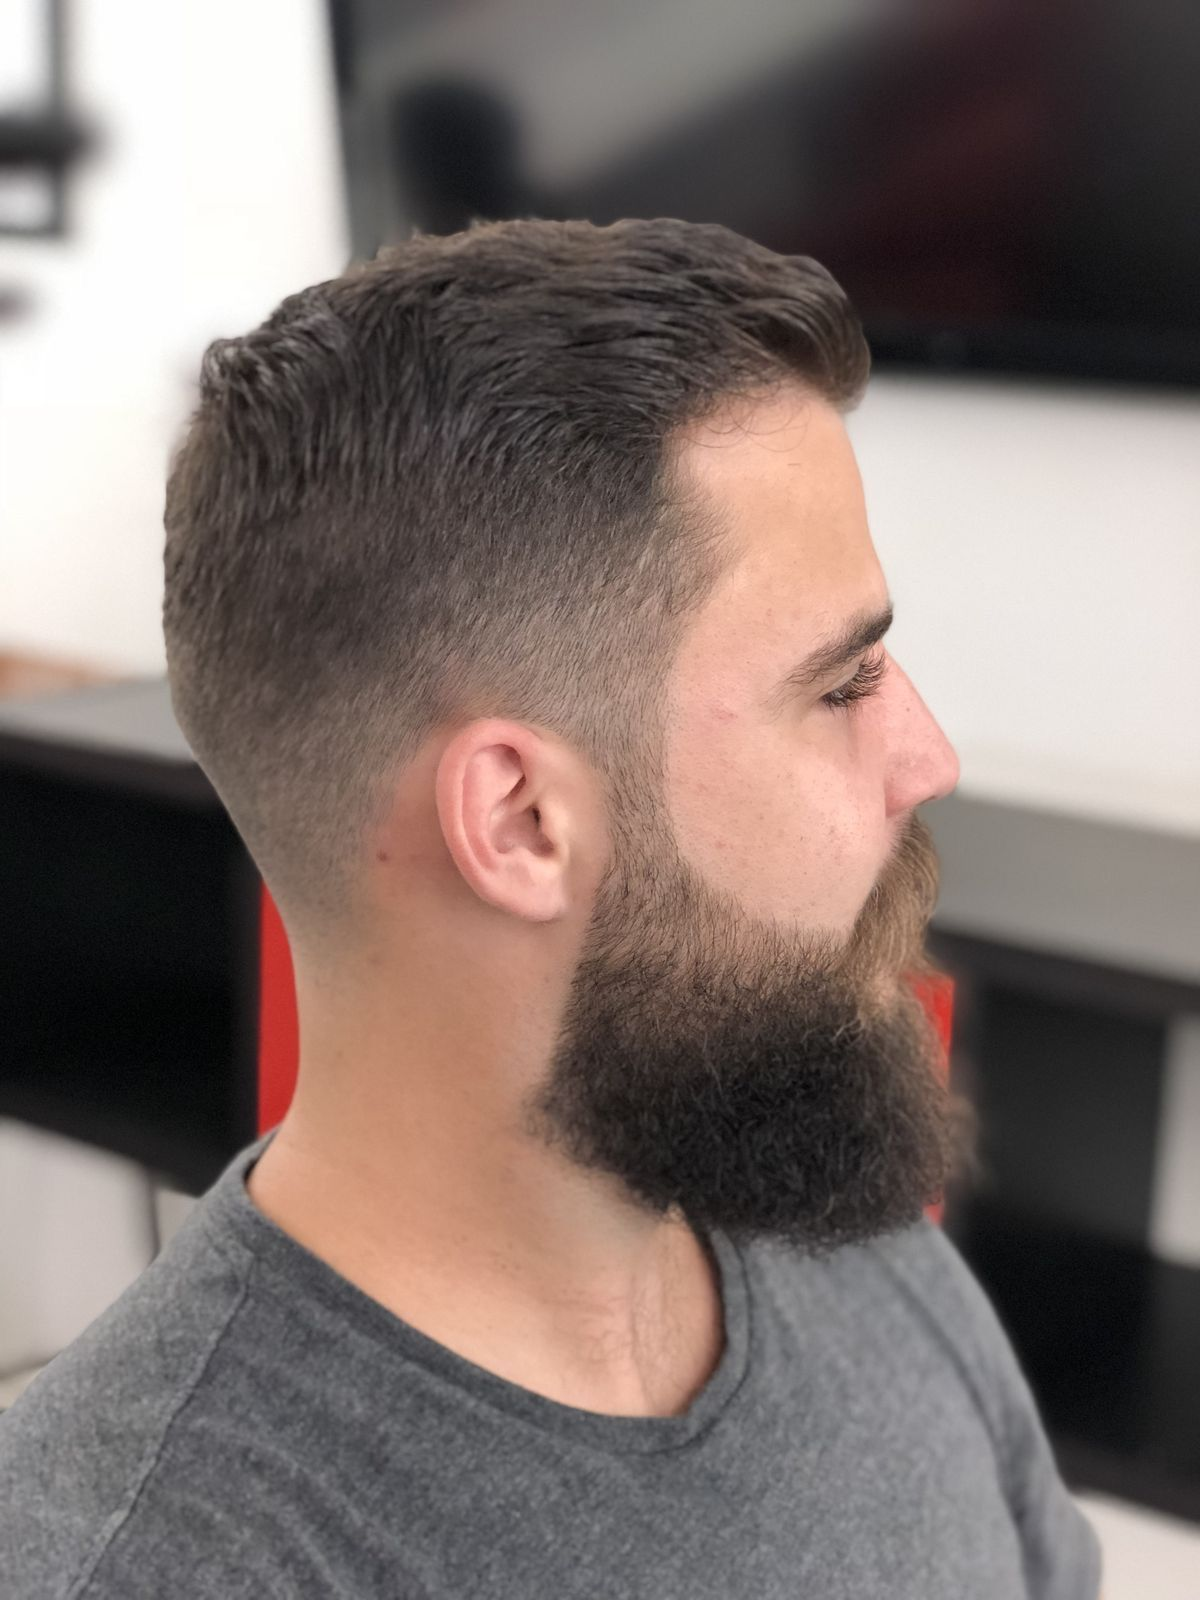 pin by olivia jeffrey hair on hair cuts in 2019 | hair